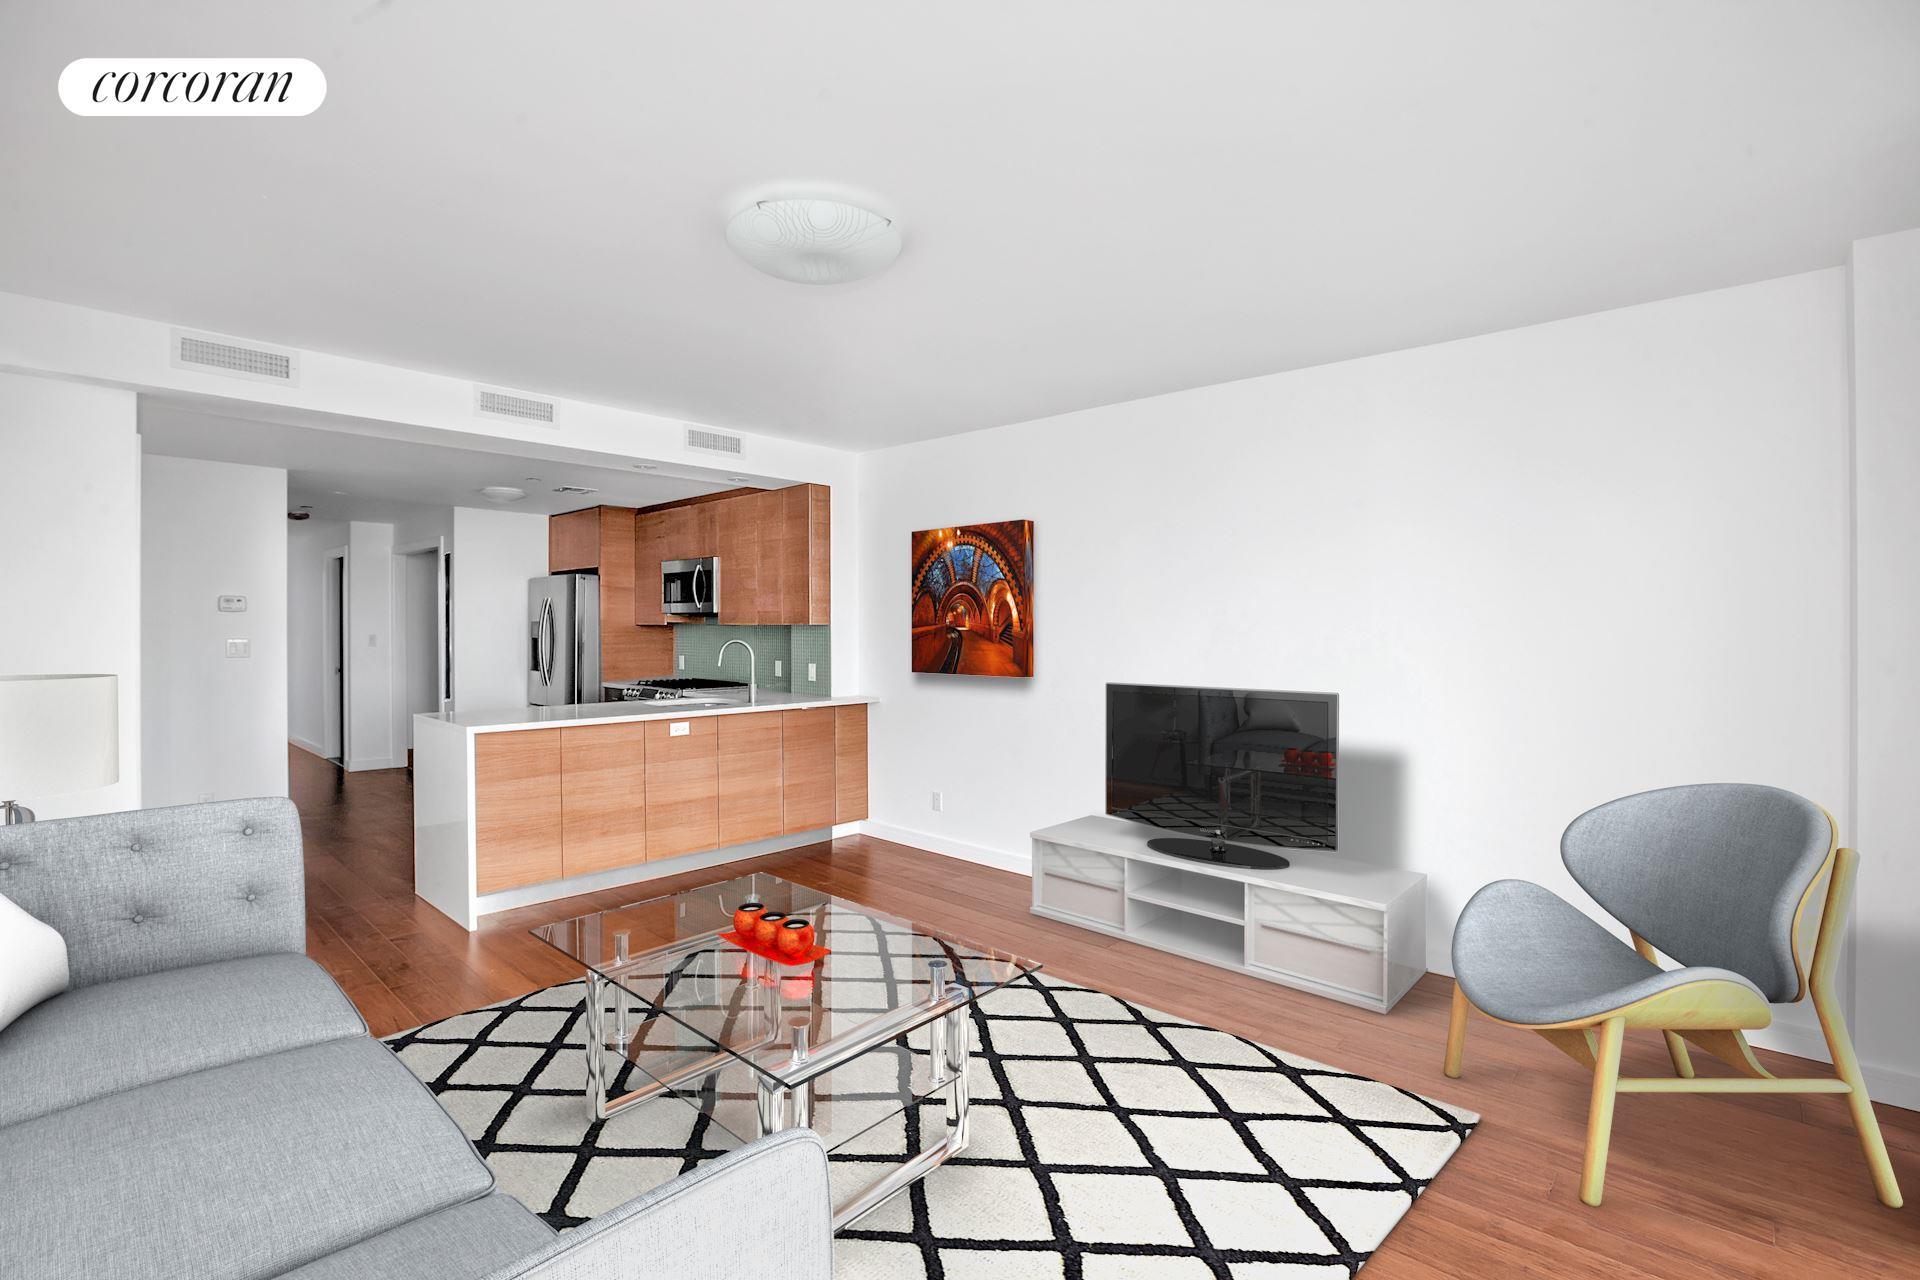 Corcoran, 330 Bleecker Street, Apt. PH/4B, Bushwick Real Estate ...